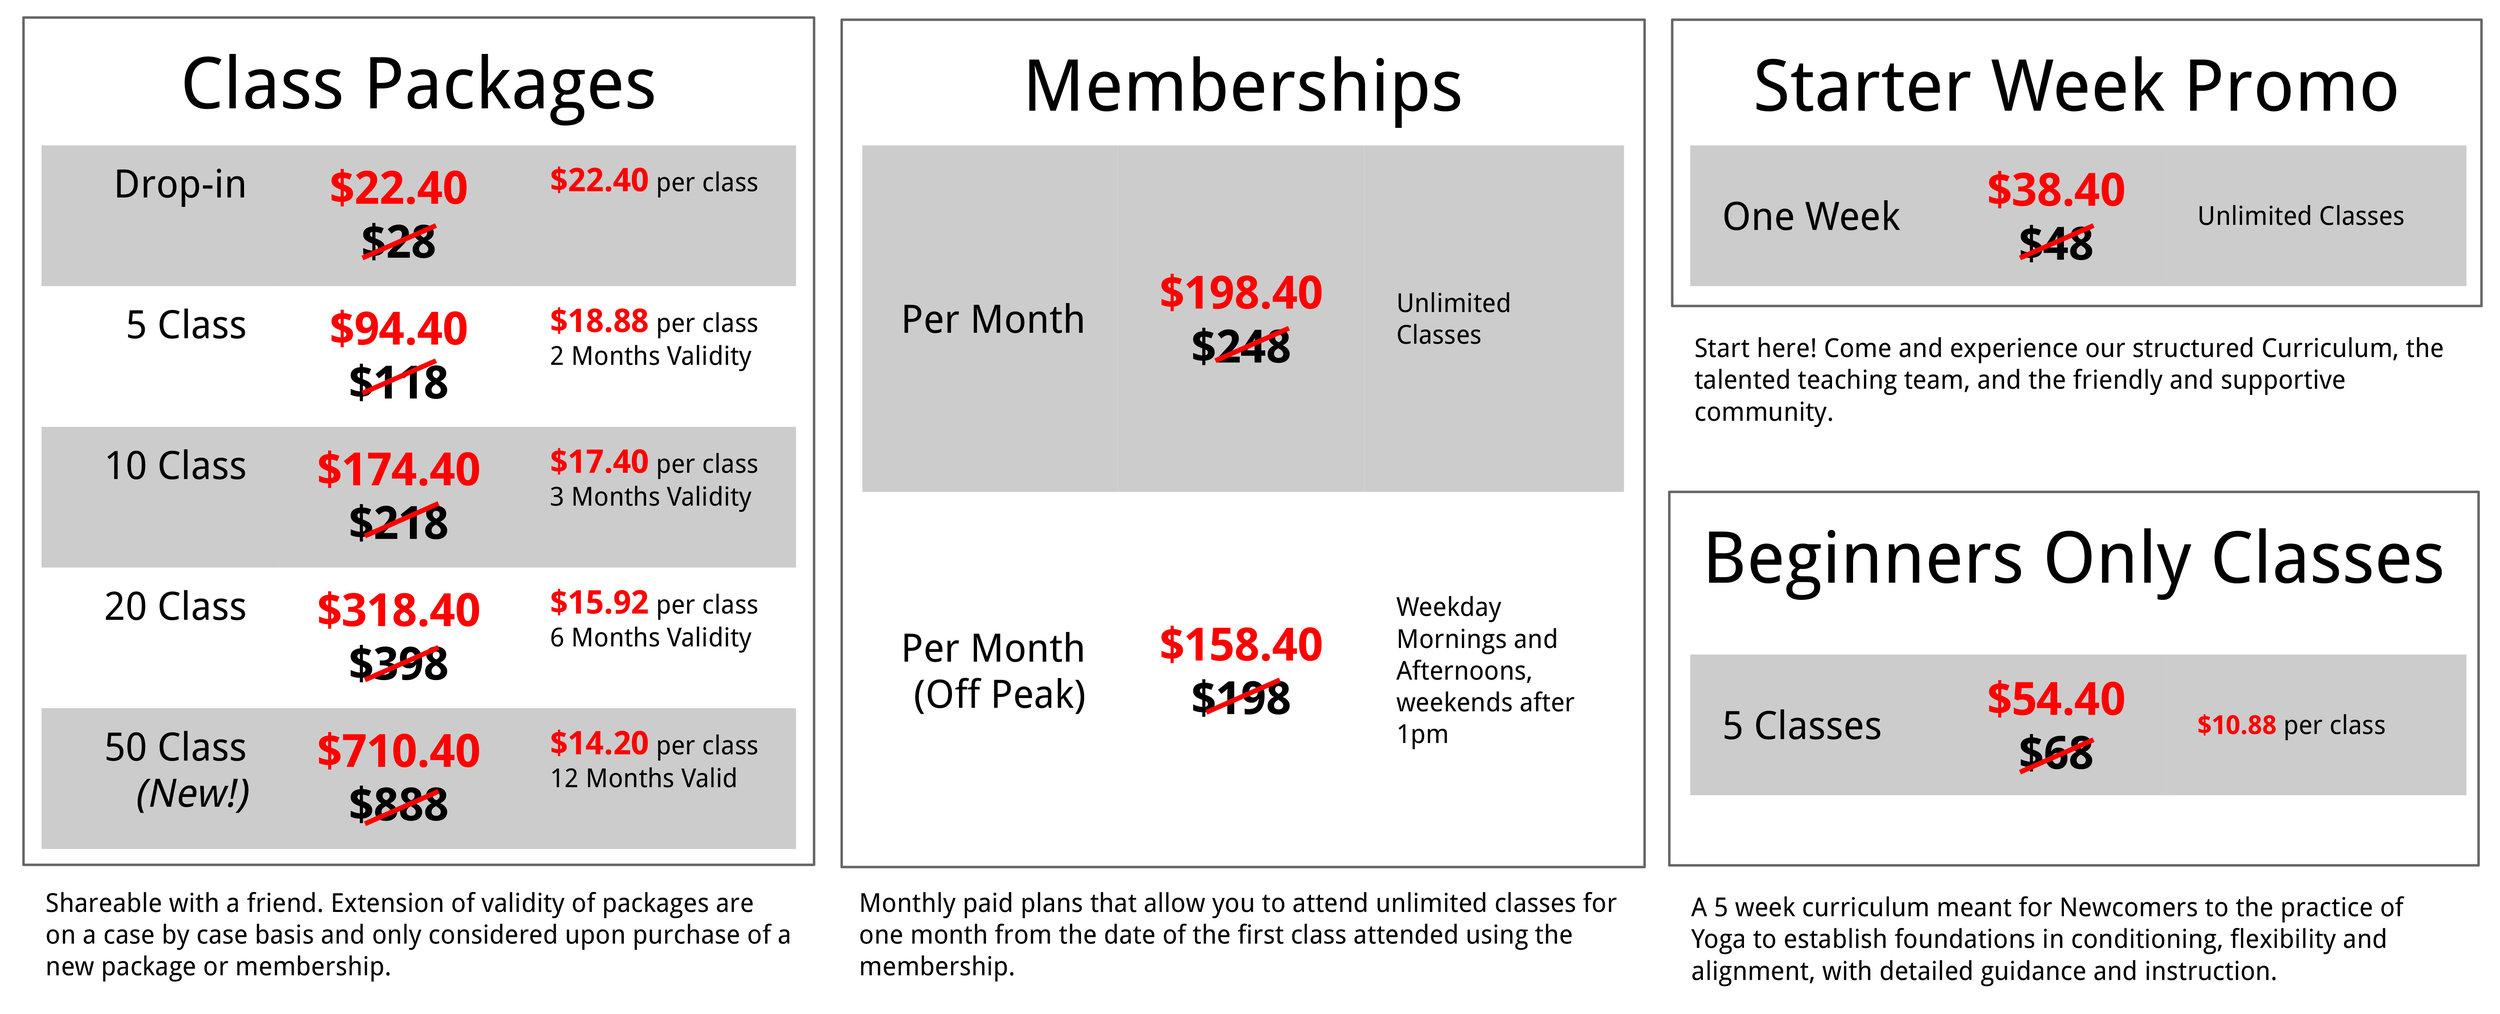 Copy of Rate Card-2.jpg